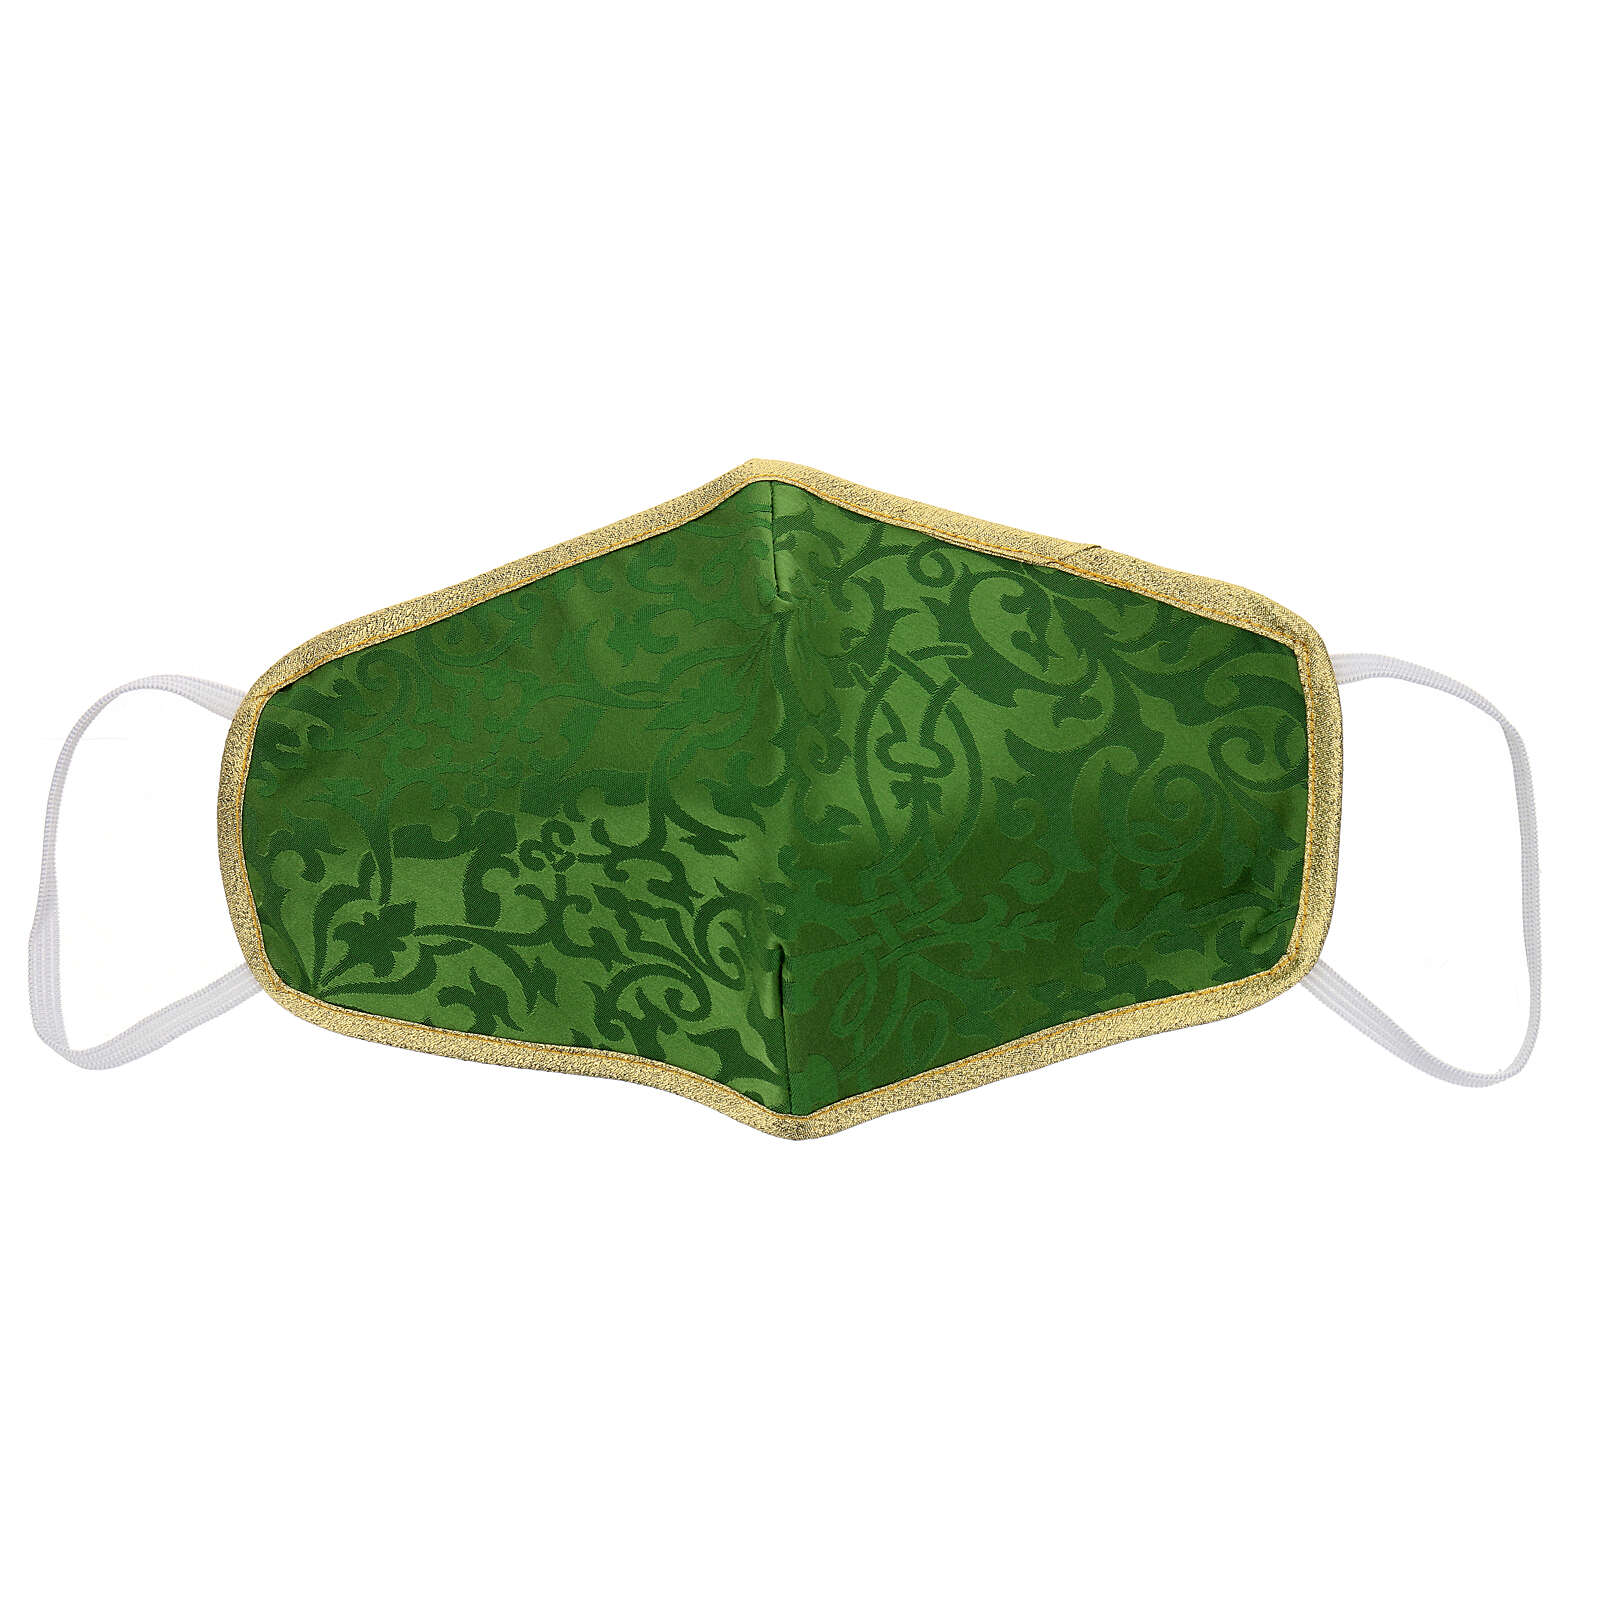 Washable fabric mask green/gold edge 3